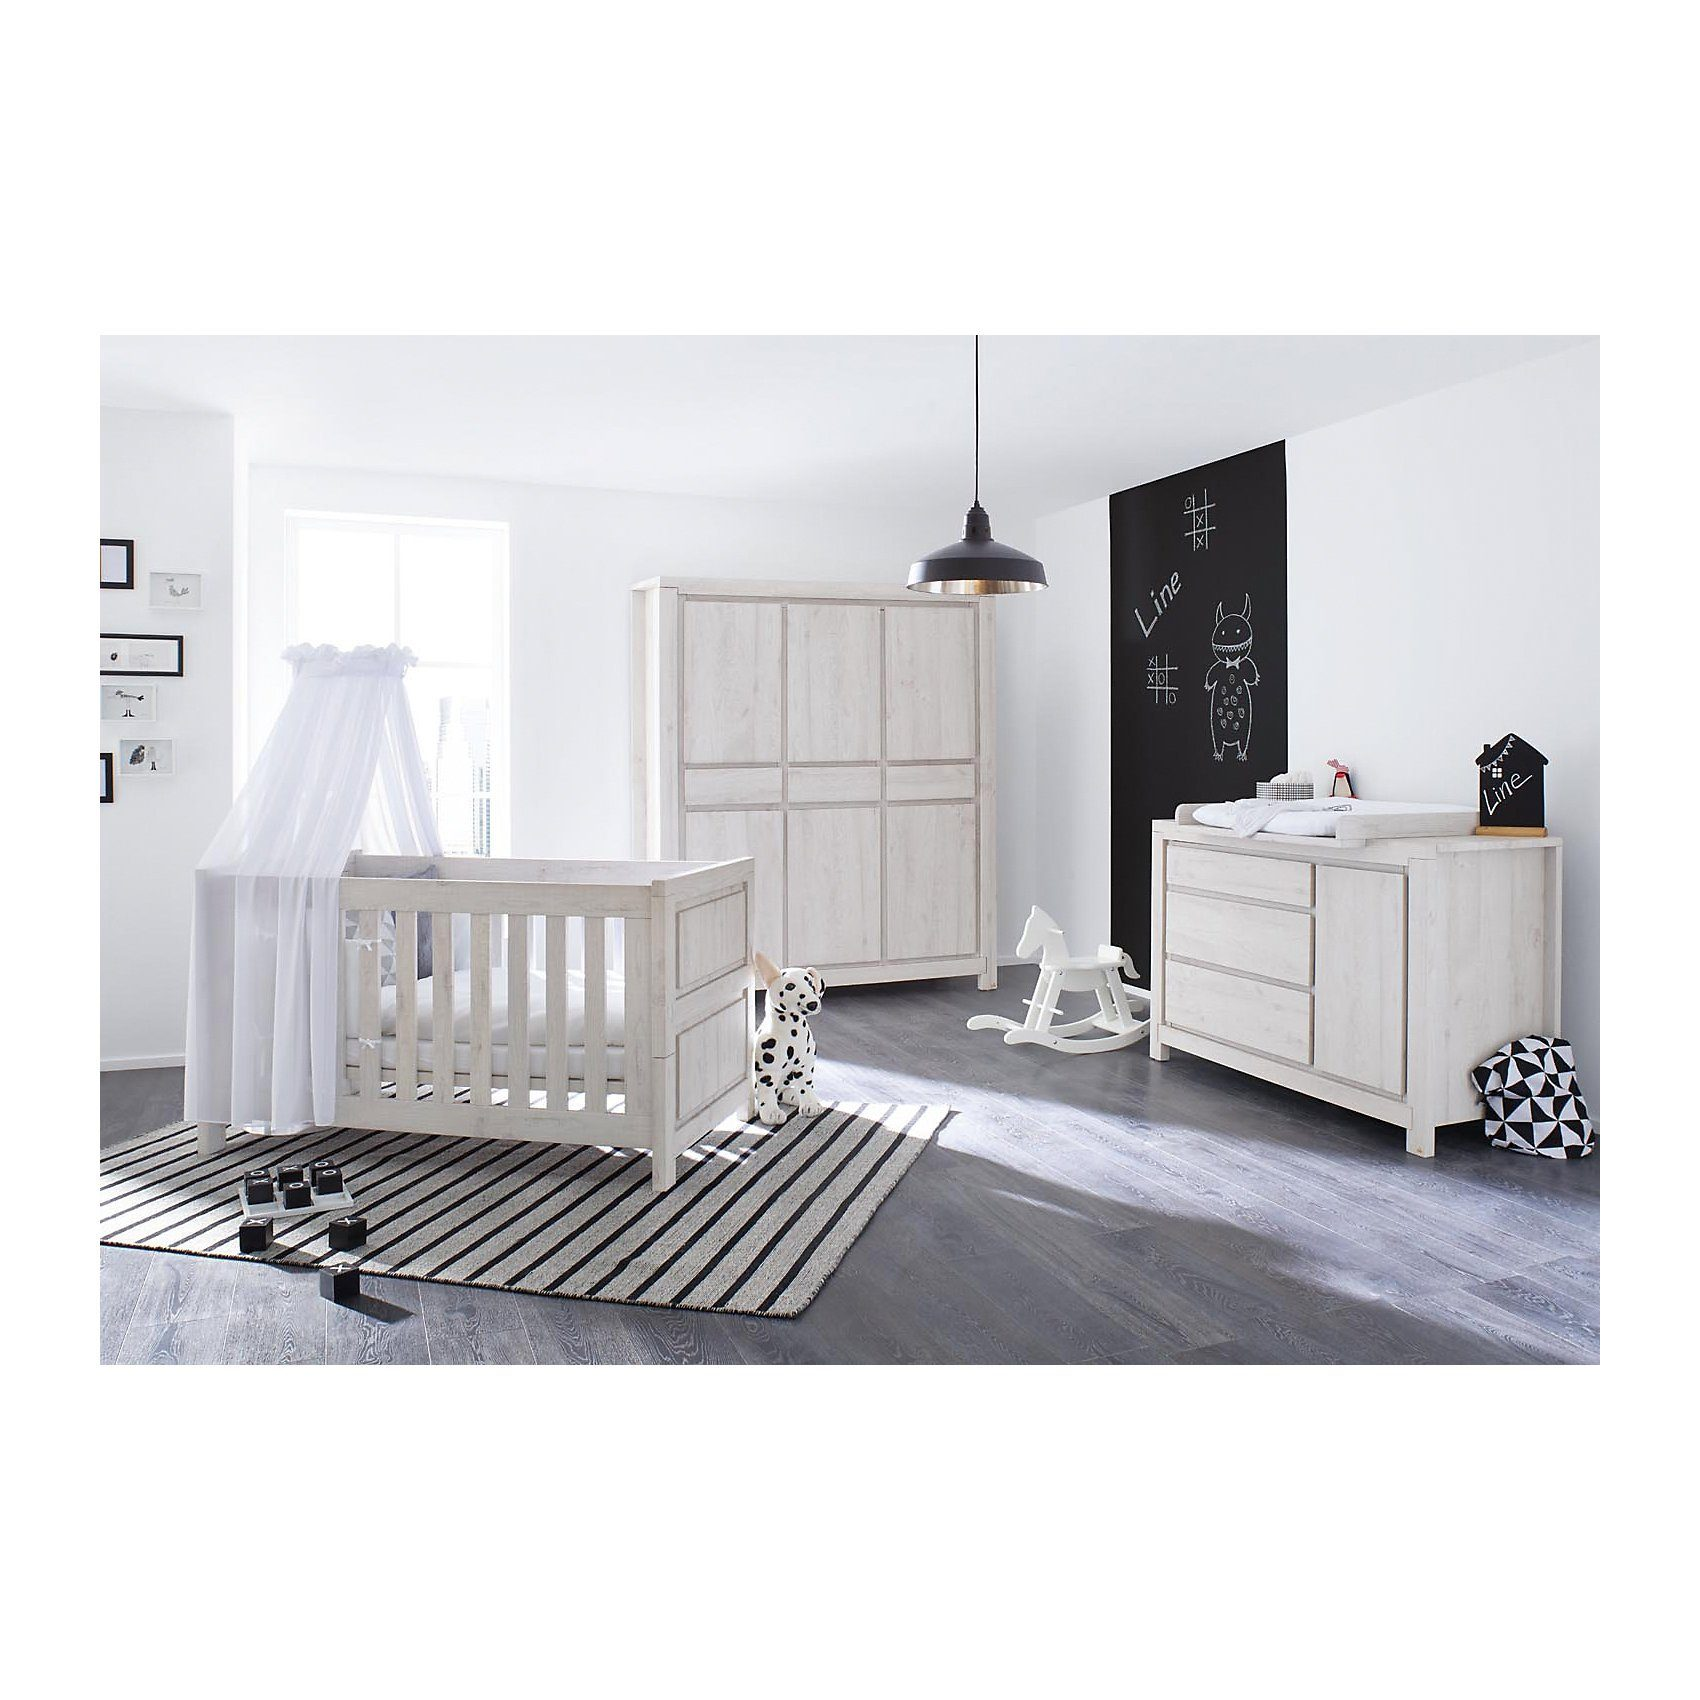 Pinolino Komplett Kinderzimmer LINE breit, (Kinderbett, Wickelkommode